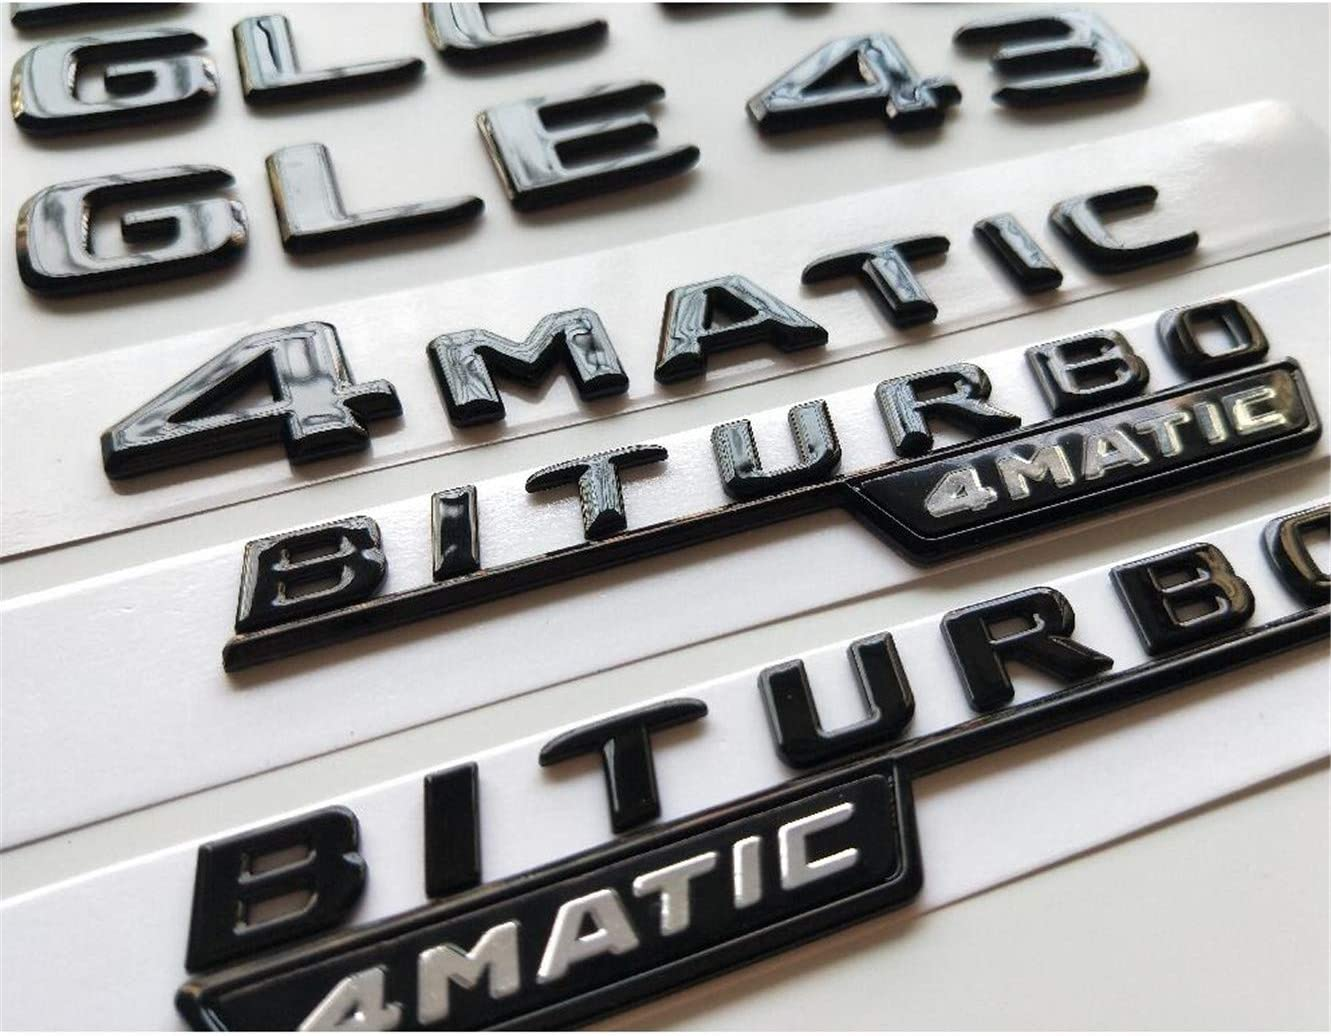 cvnbdfgjhdfjh Gl/änzend Schwarz Fender Emblem Badge W205 C43 W213 E43 X253 GLC43 GLE43 AMG BITURBO 4 Matic